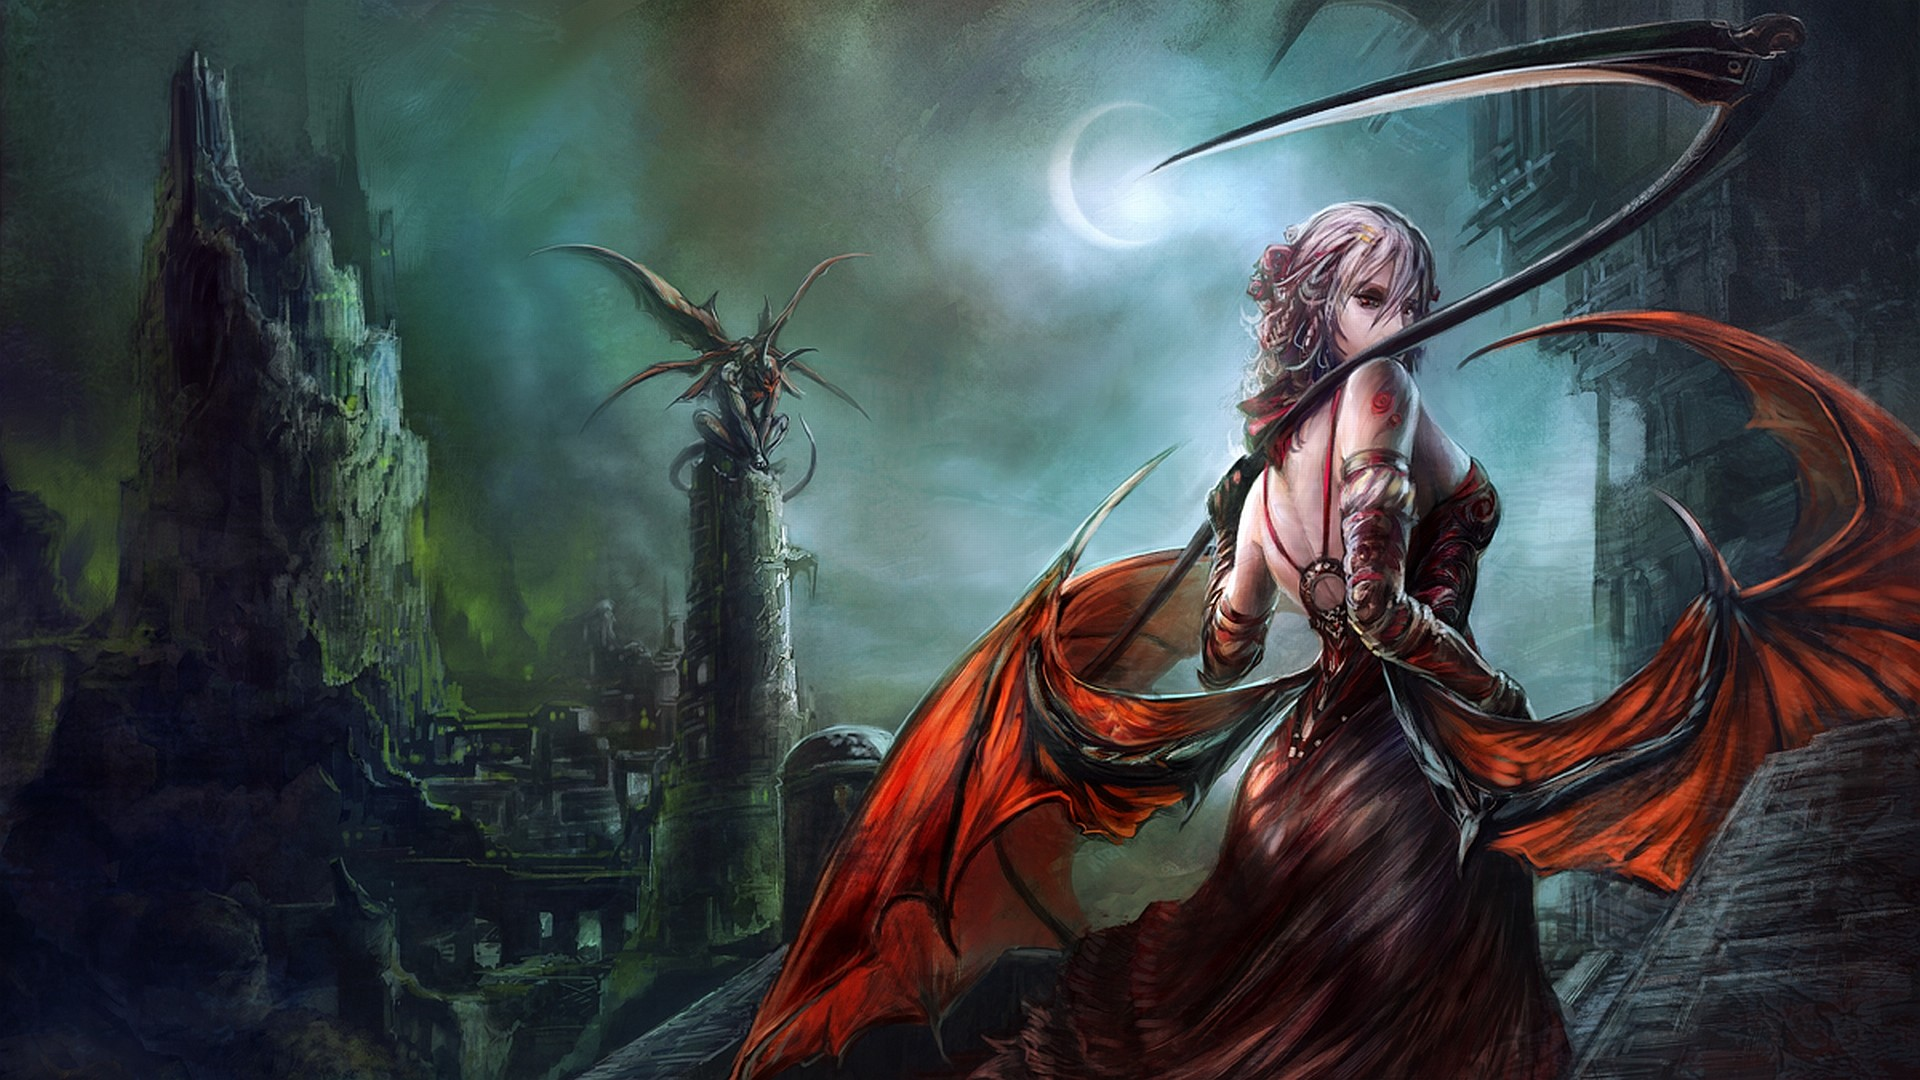 Big Dark Female Warrior Art | Alpha Coders | Wallpaper Abyss Fantasy Women  Warrior 169072